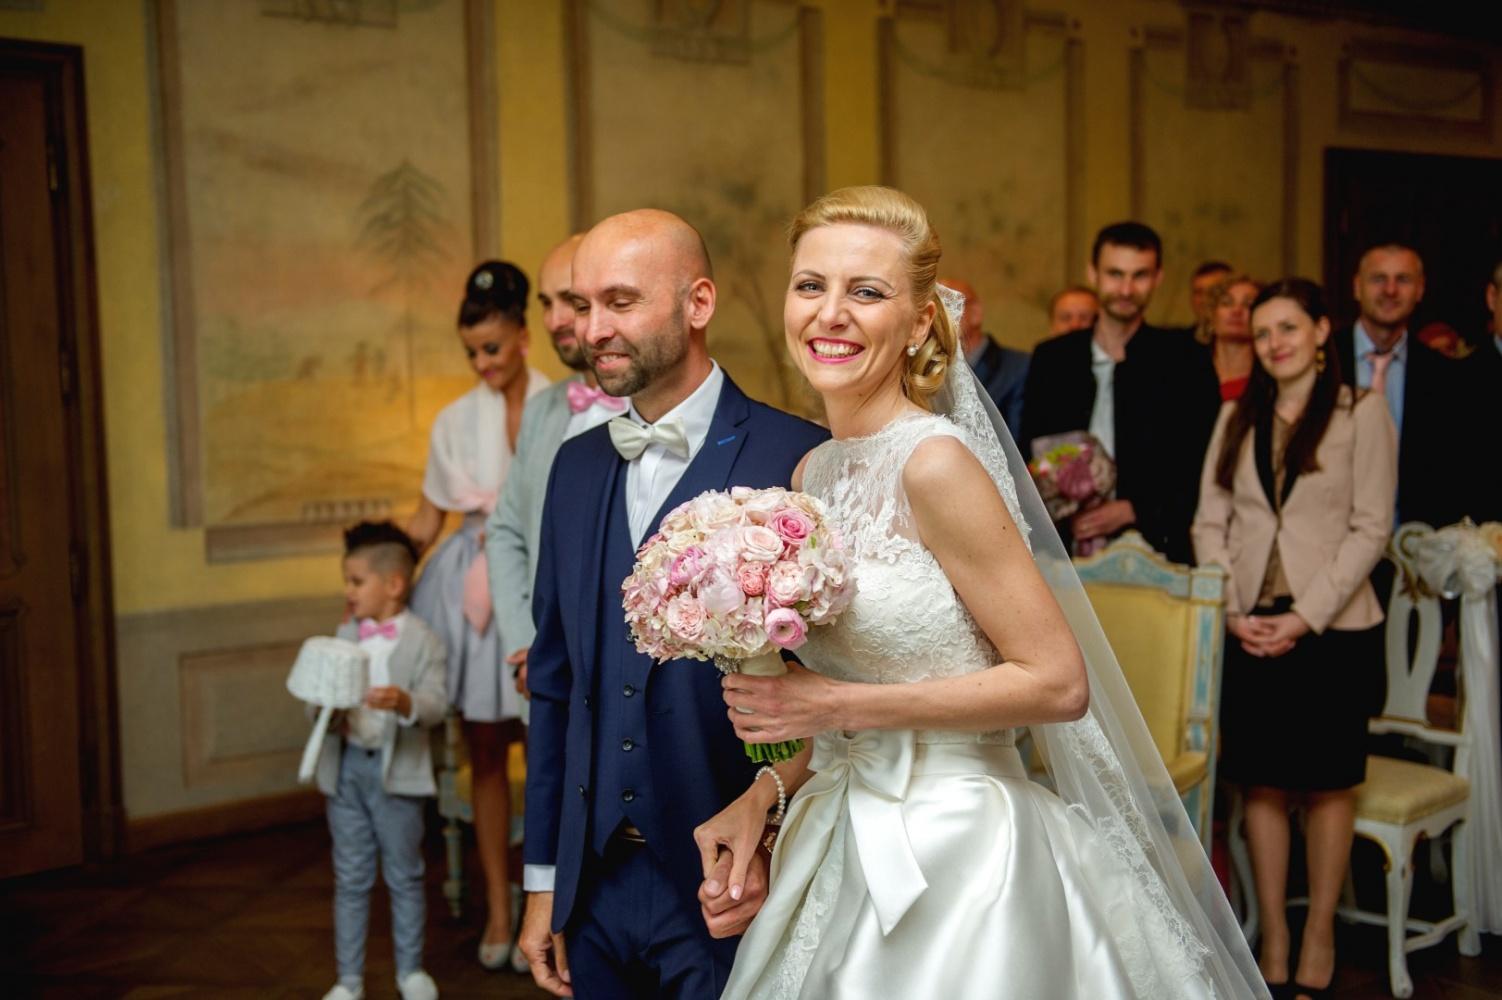 http://www.fotoz.sk/images/gallery-26/normal/svadba_hotel-chateau-bela_074.jpg